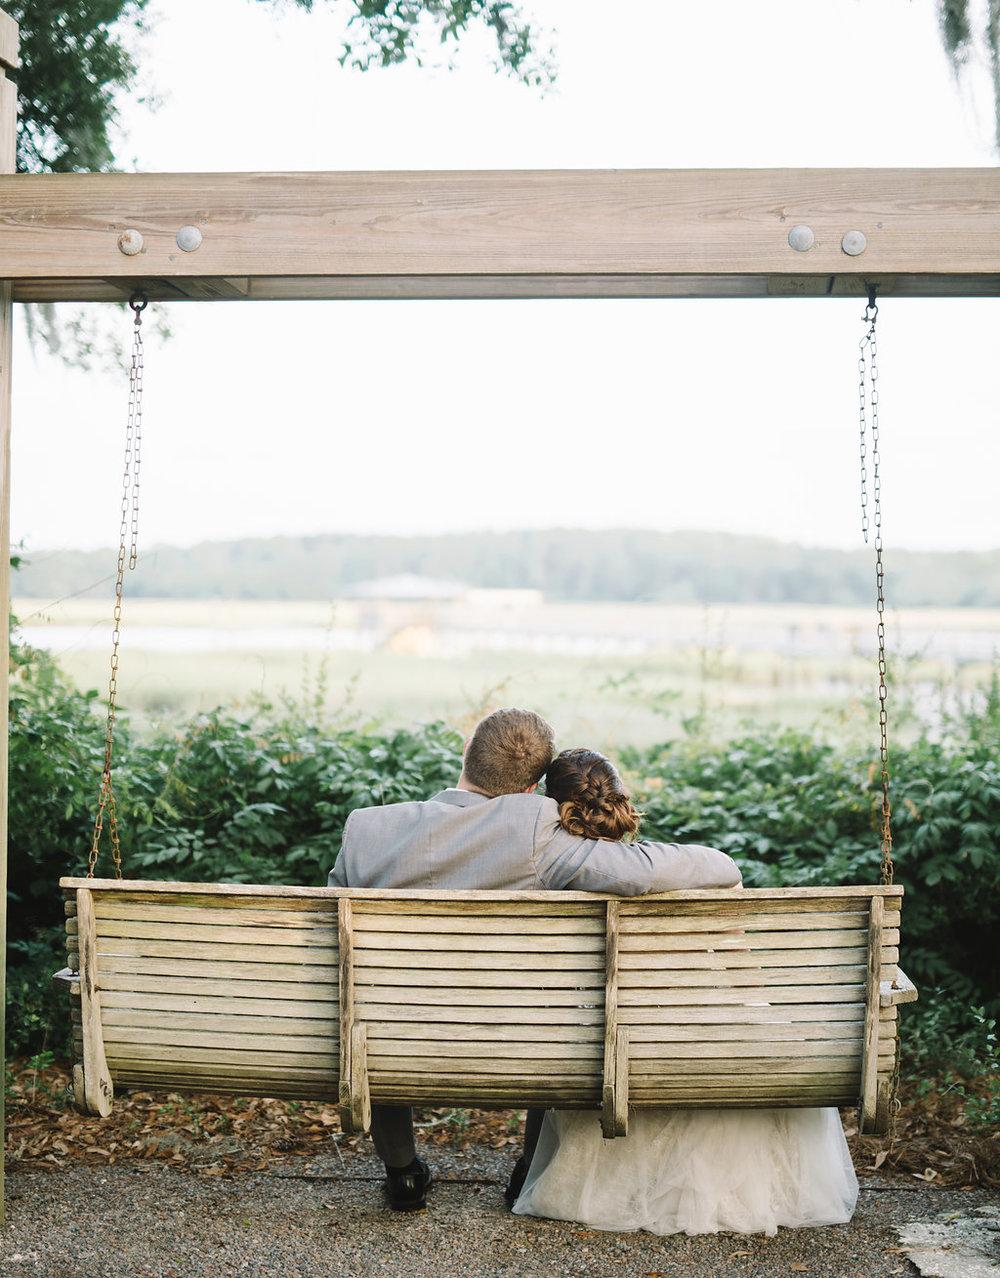 meagan-and-brenden-rach-loves-troy-photography-ivory-and-beau-bridal-boutqiue-ti-adora-wedding-dress-gold-lace-wedding-dress-savannah-wedding-planner-savannah-weddings-oldfield-plantation-wedding-savannah-florist-27.jpg